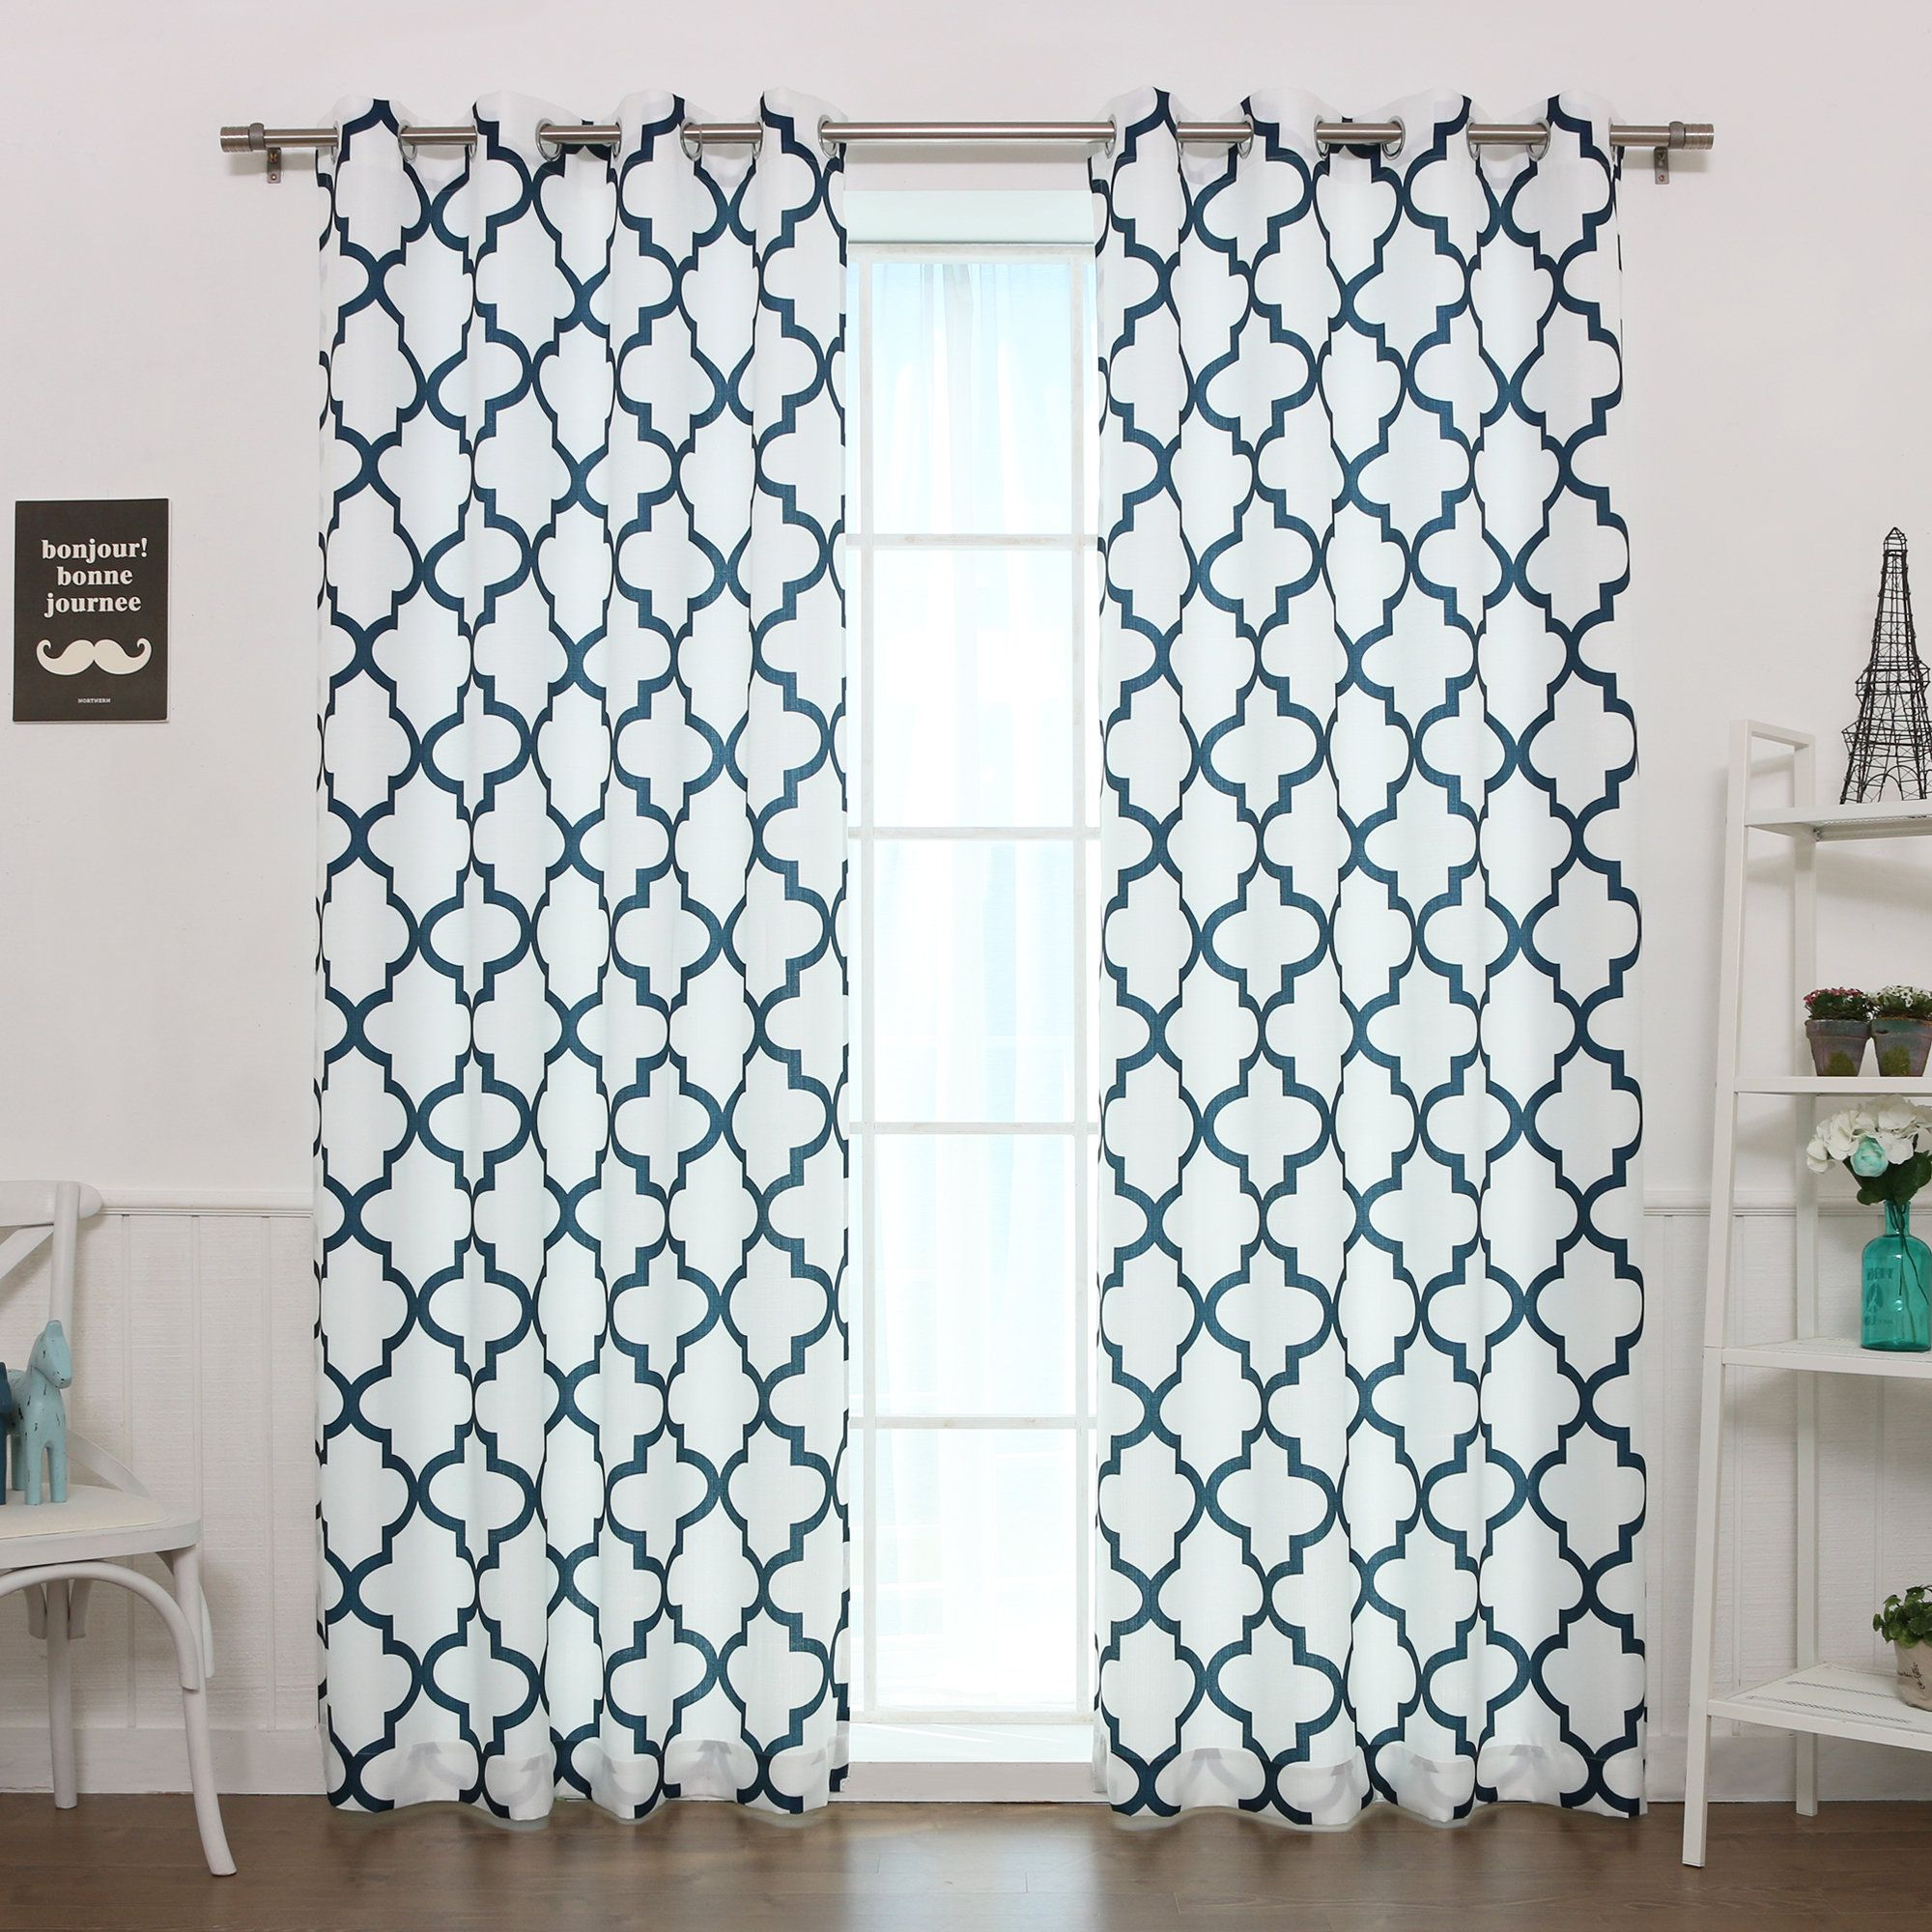 Arrey basketweave curtain panels products pinterest curtains